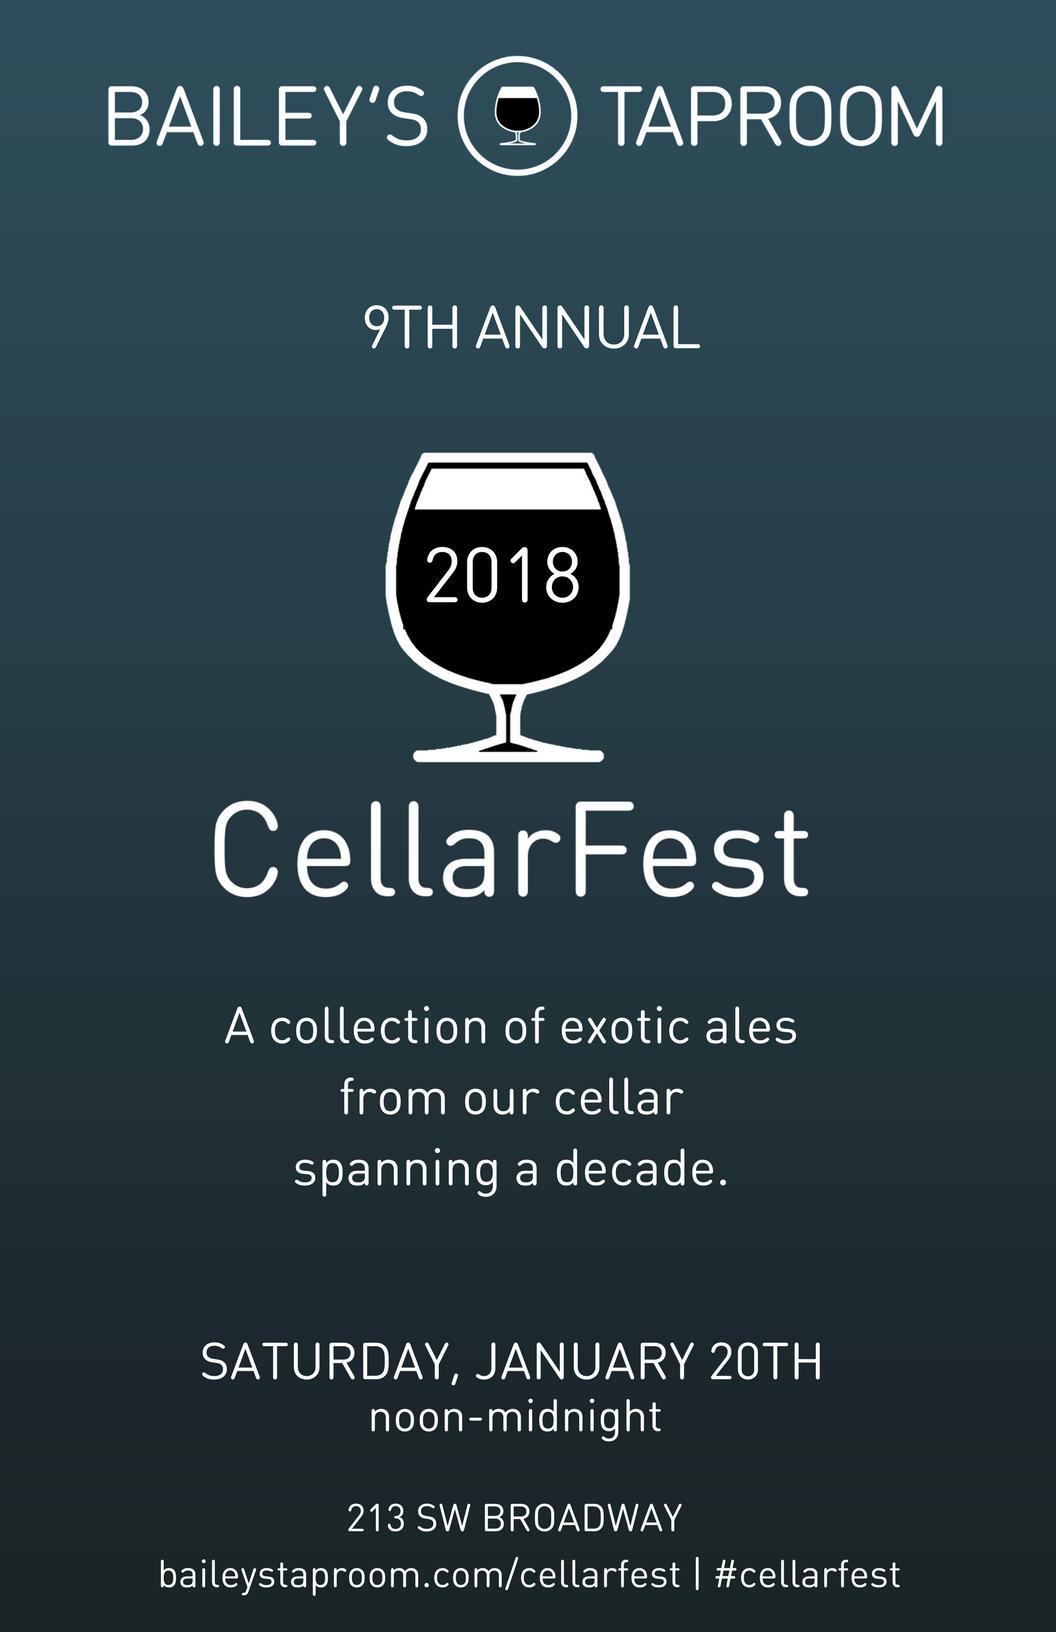 Bailey's 9th Annual CellarFest